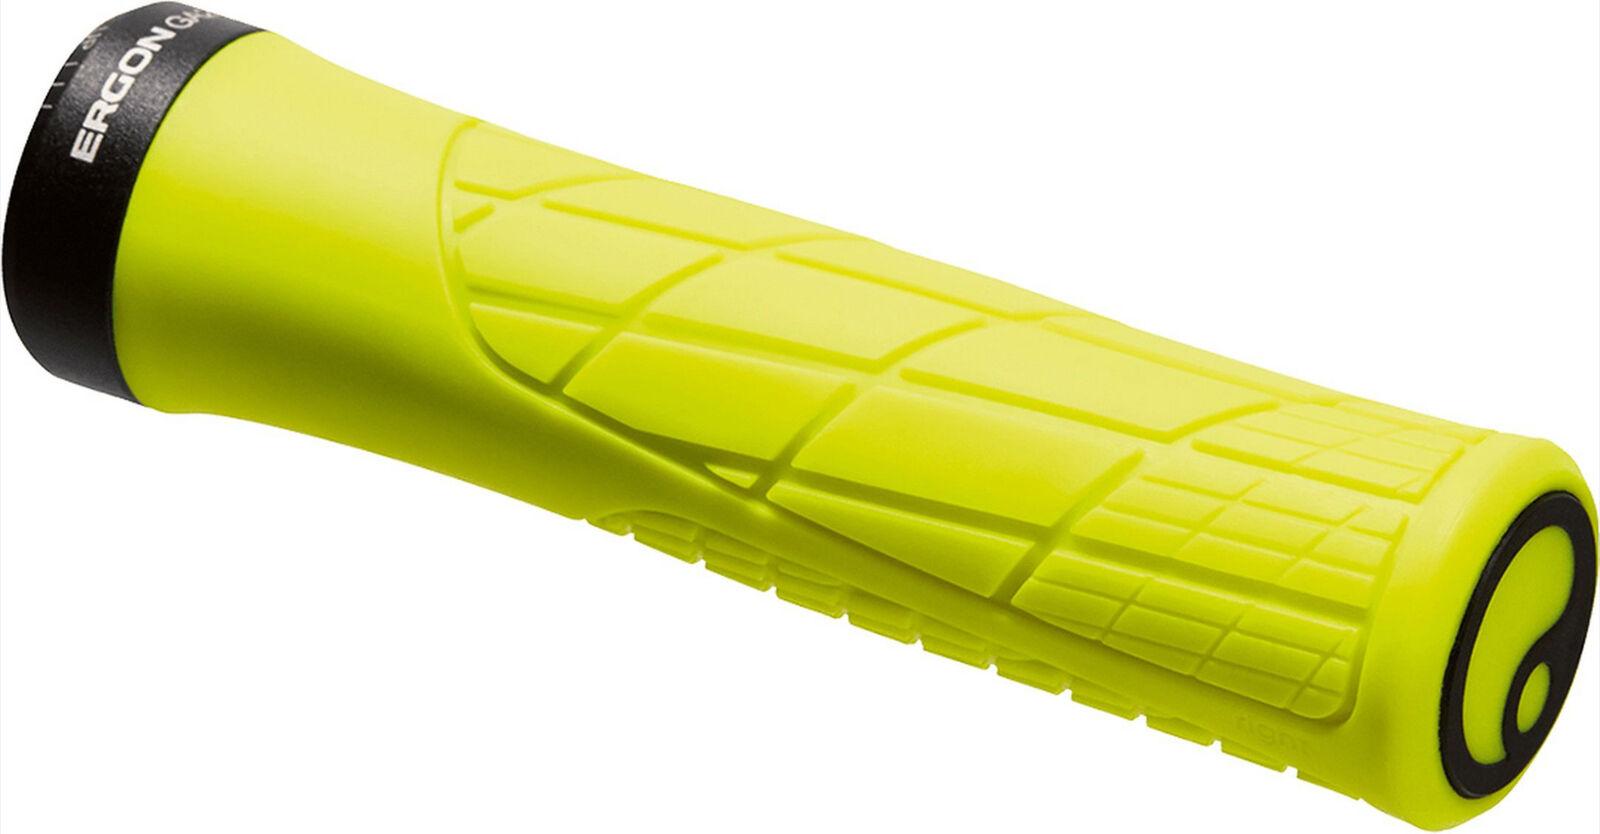 Ergon GA2 Mountain  Bike Grips - Yellow  top brands sell cheap